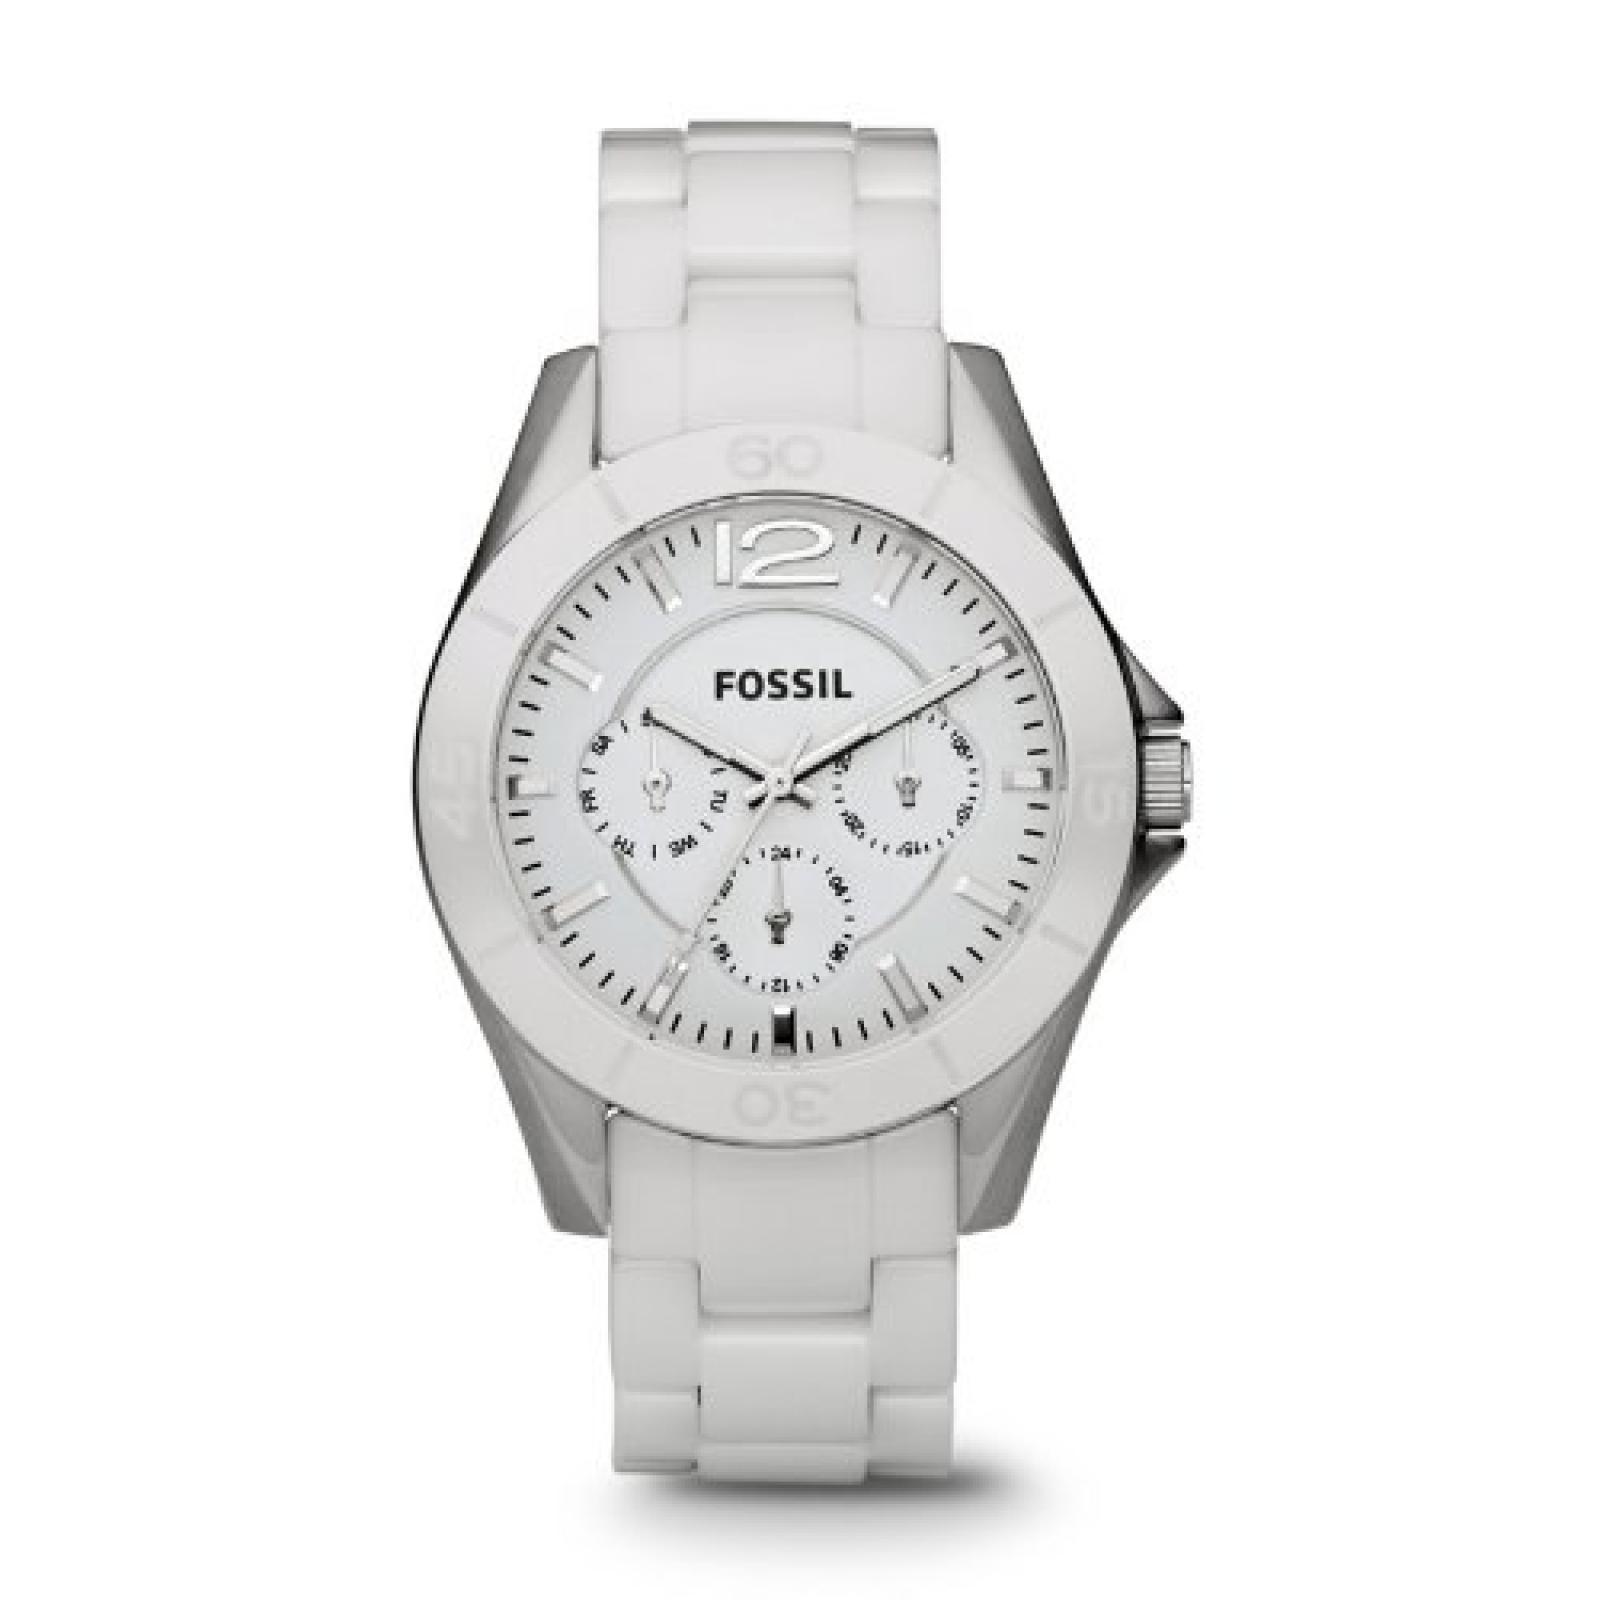 Fossil Damen-Armbanduhr Analog Quarz CE1002